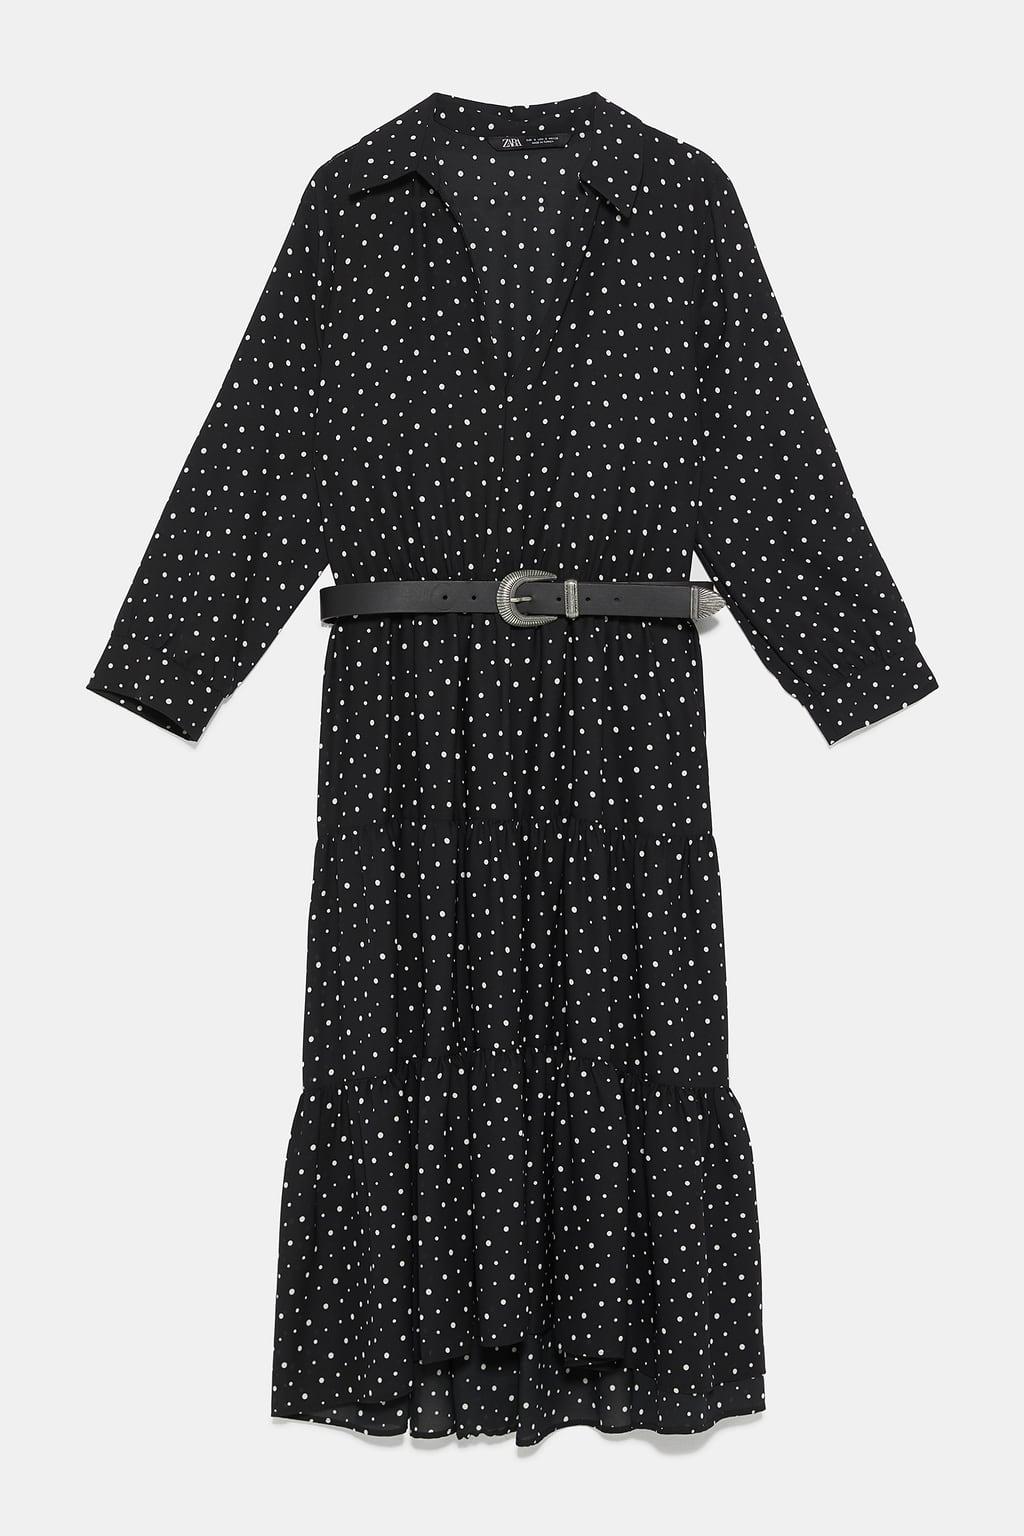 ZARA  10 casual φορέματα σε άσπρο-μαύρο για τη νέα σεζόν! - mononews d3e29582afe